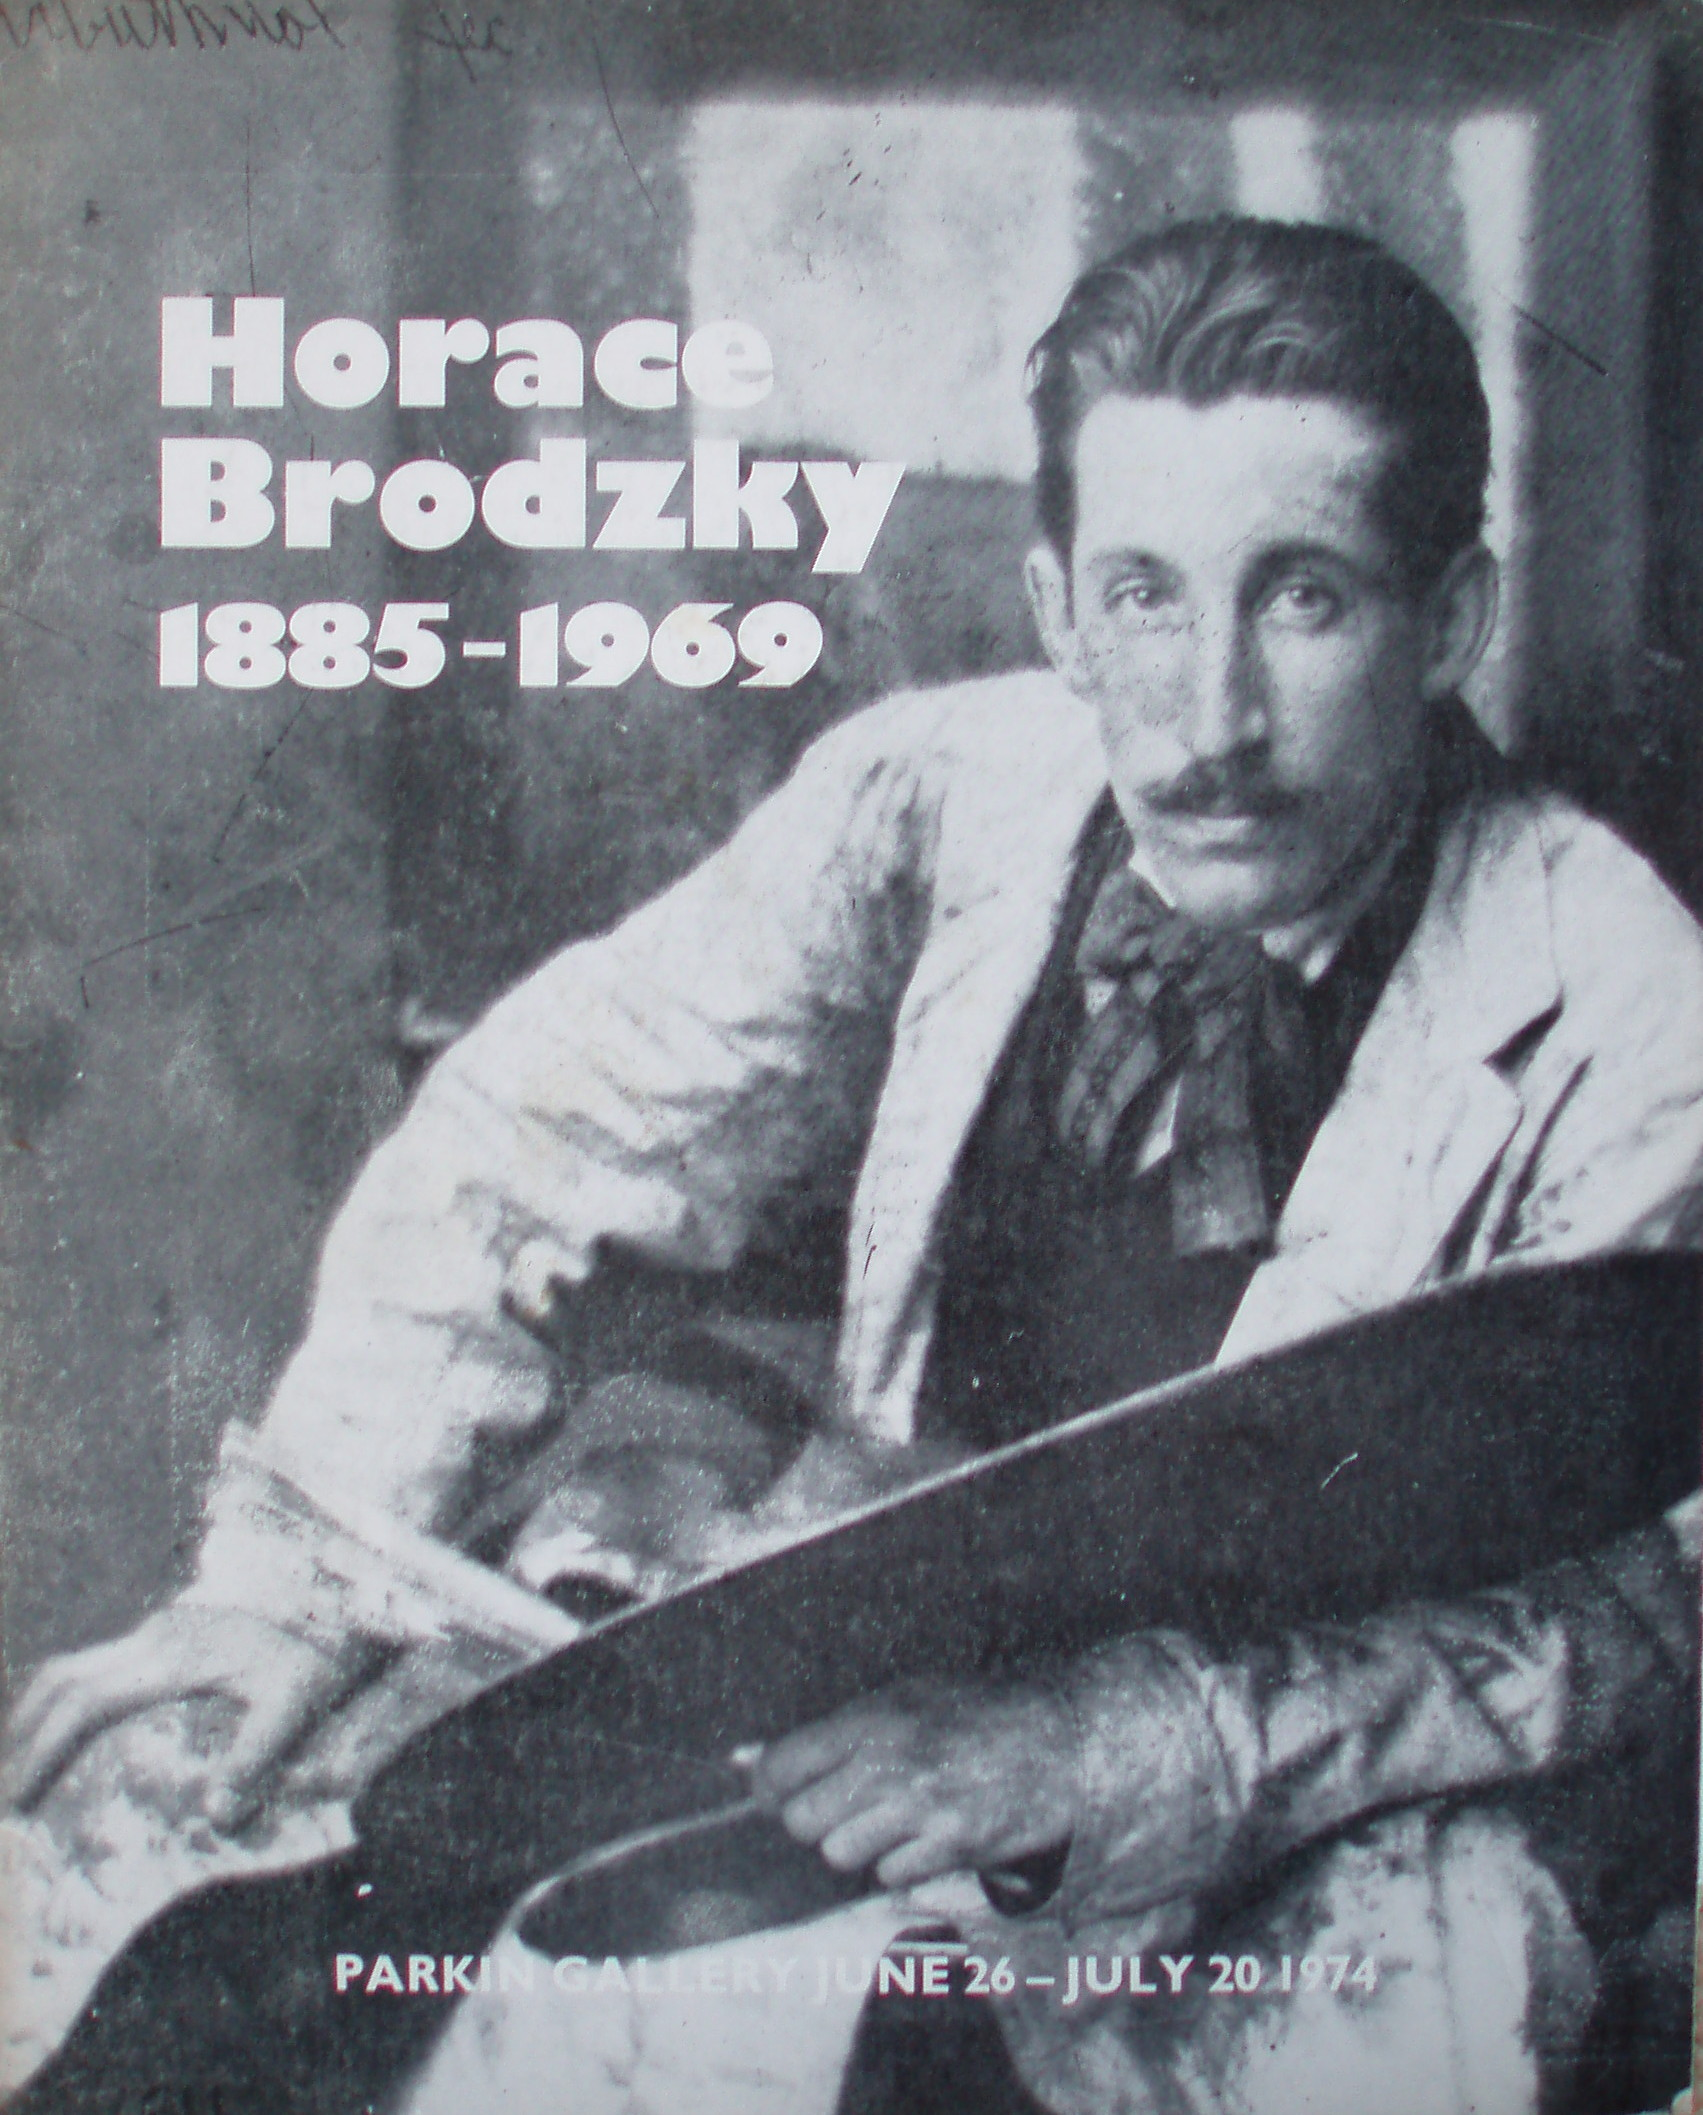 Horace Brodzky 1885-1969